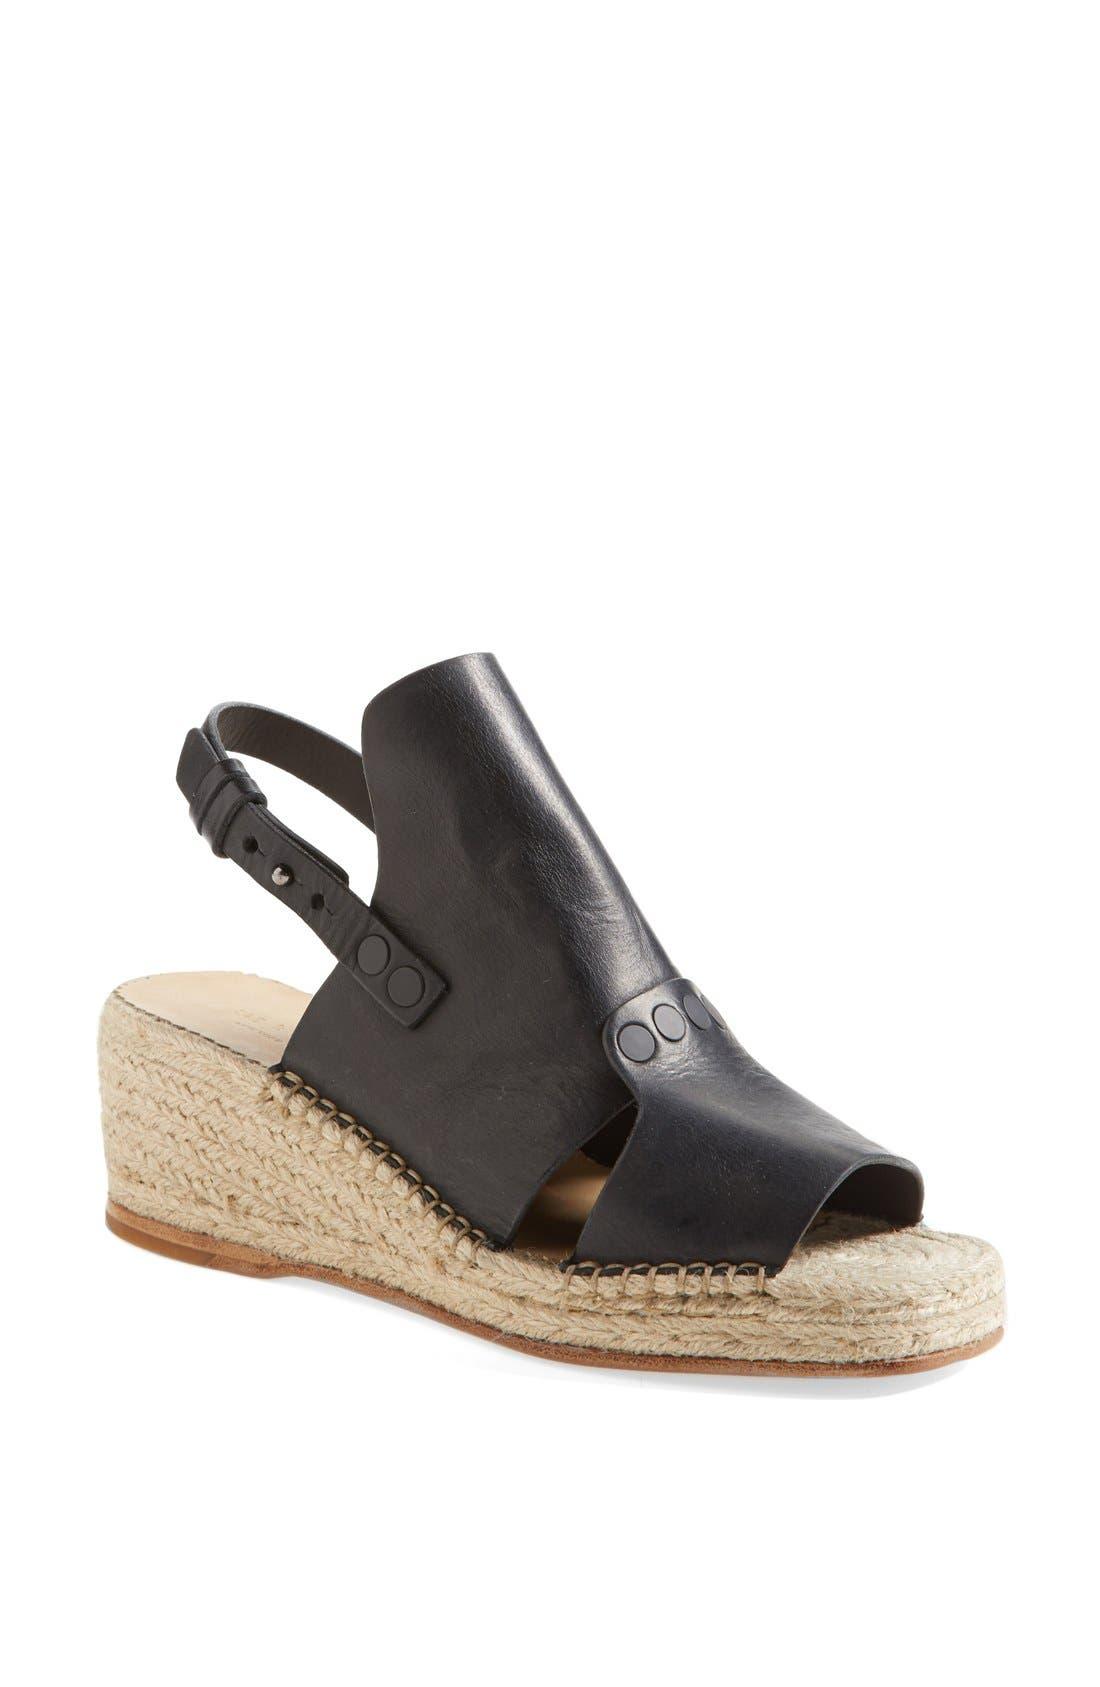 Alternate Image 1 Selected - rag & bone 'Sayre II' Espadrille Wedge Sandal